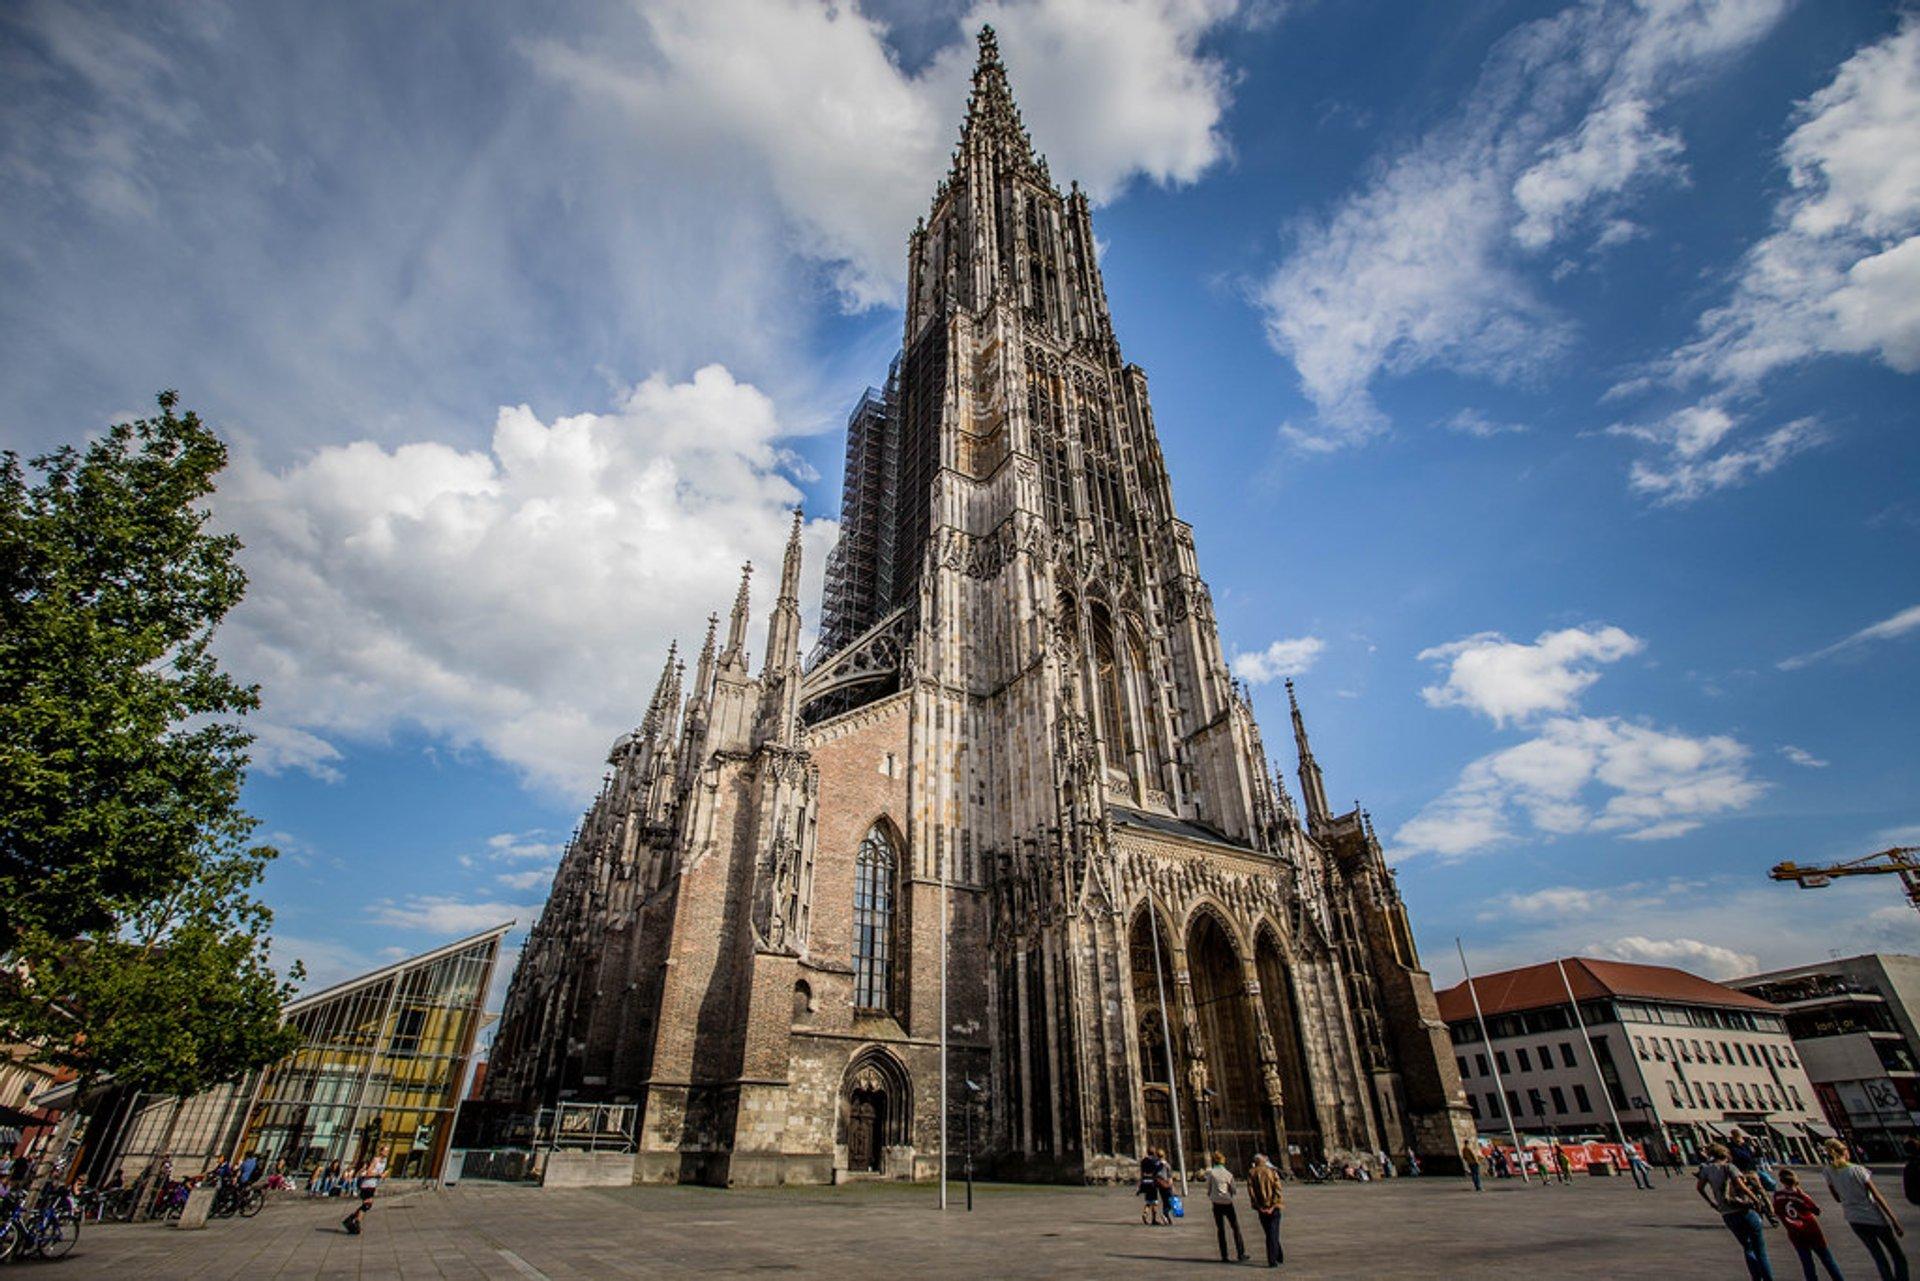 Ulm Minster (Ulmer Münster) in Germany 2020 - Best Time